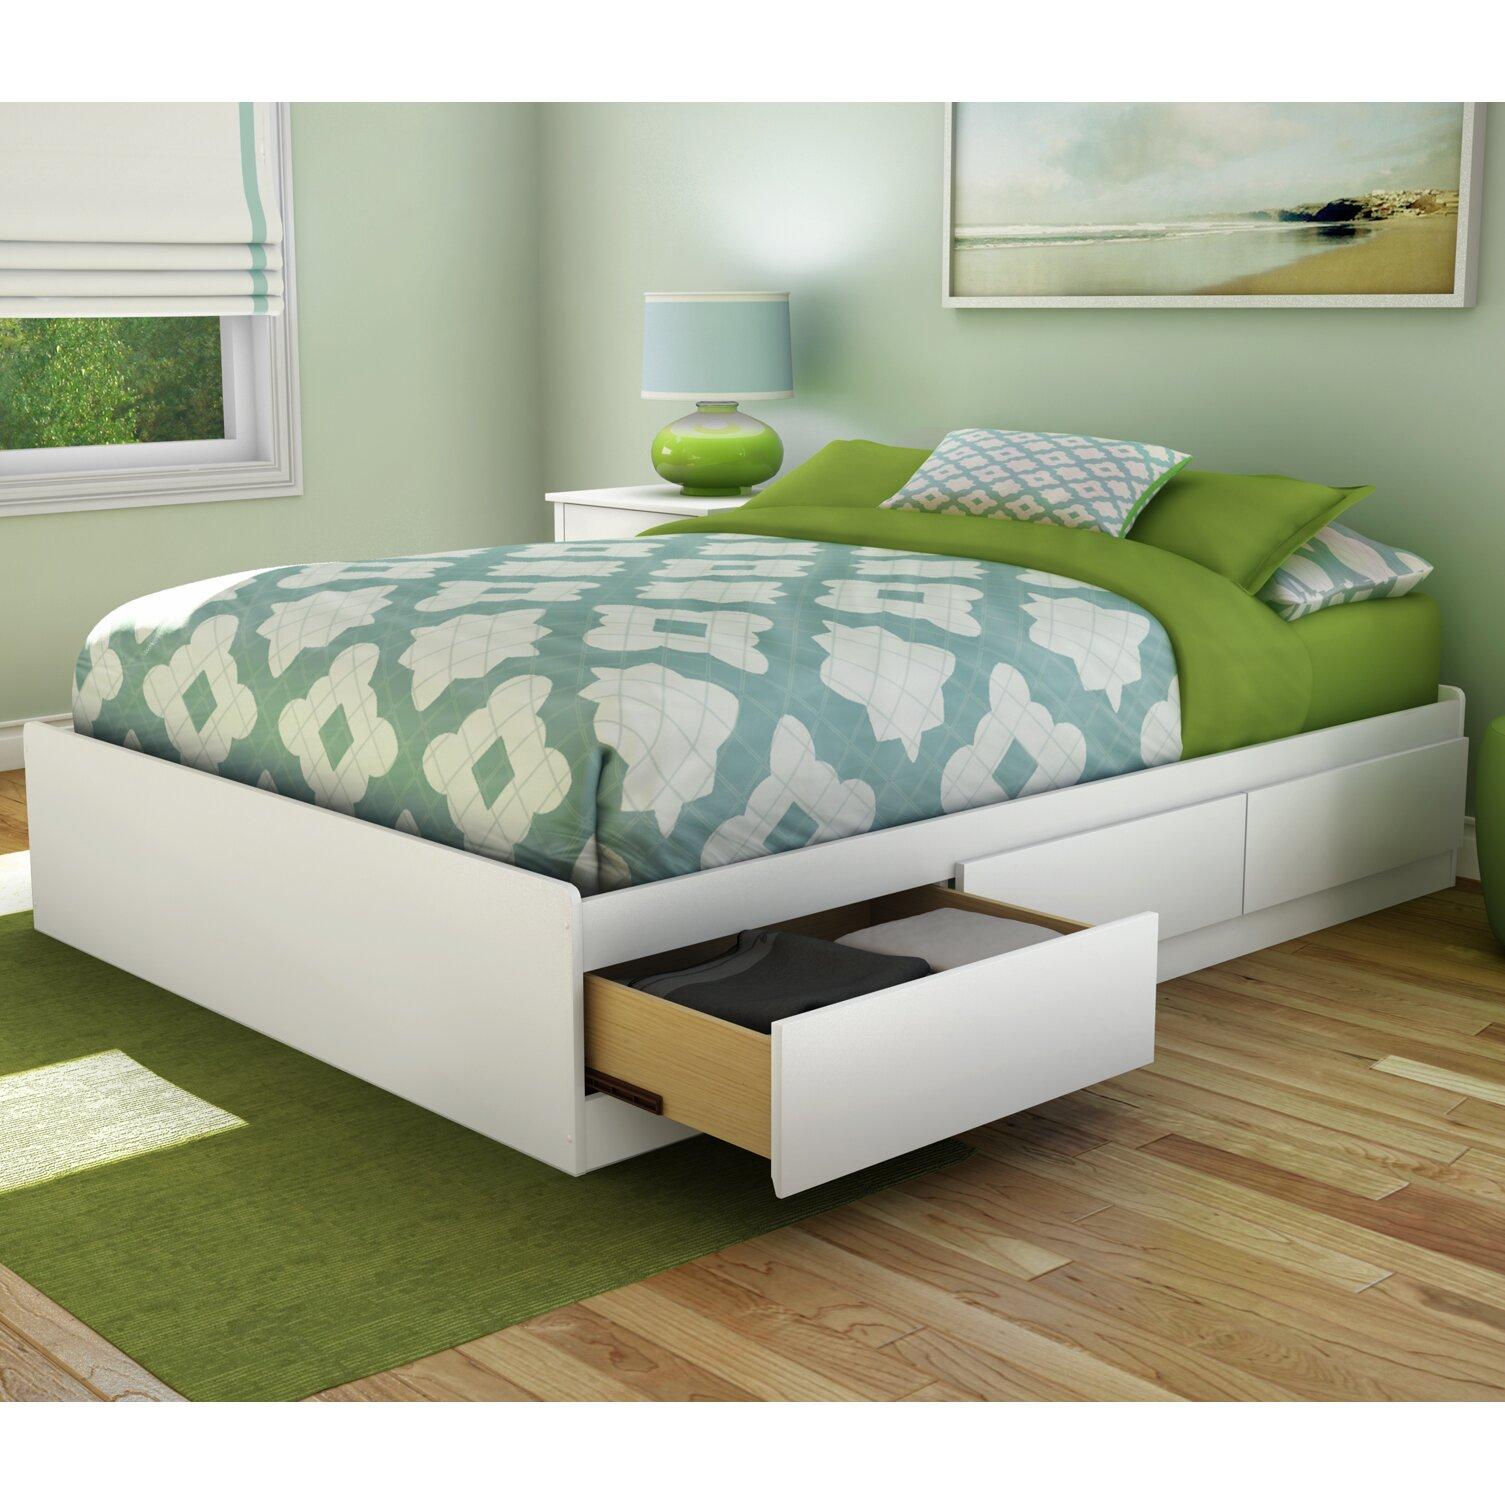 South shore step one full double storage platform bed - Platform bedroom sets with storage ...